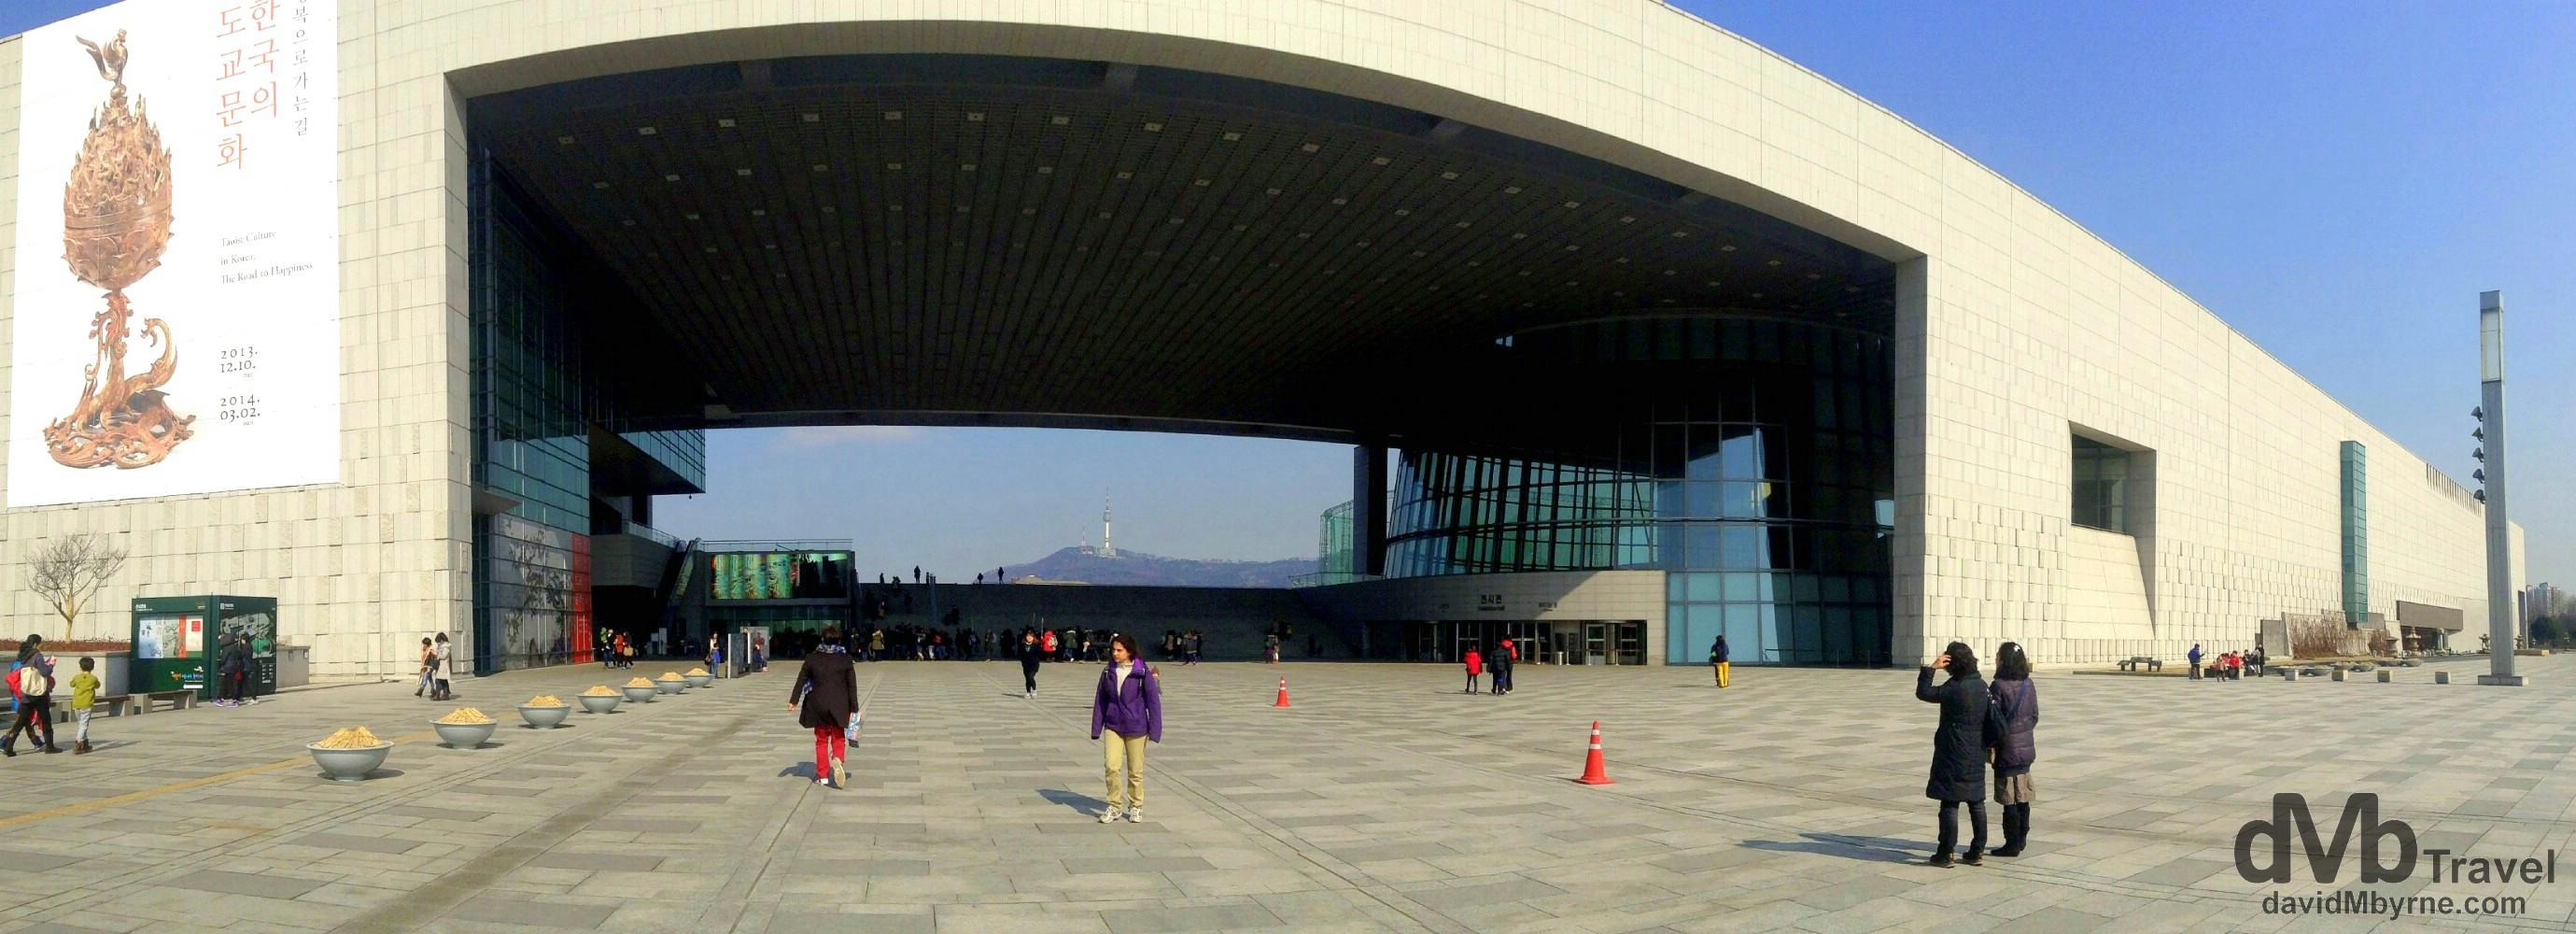 The National Museum of Korea, Yongsan Family Park, Seoul, South Korea. February 15th, 2014 (iPod panorama)